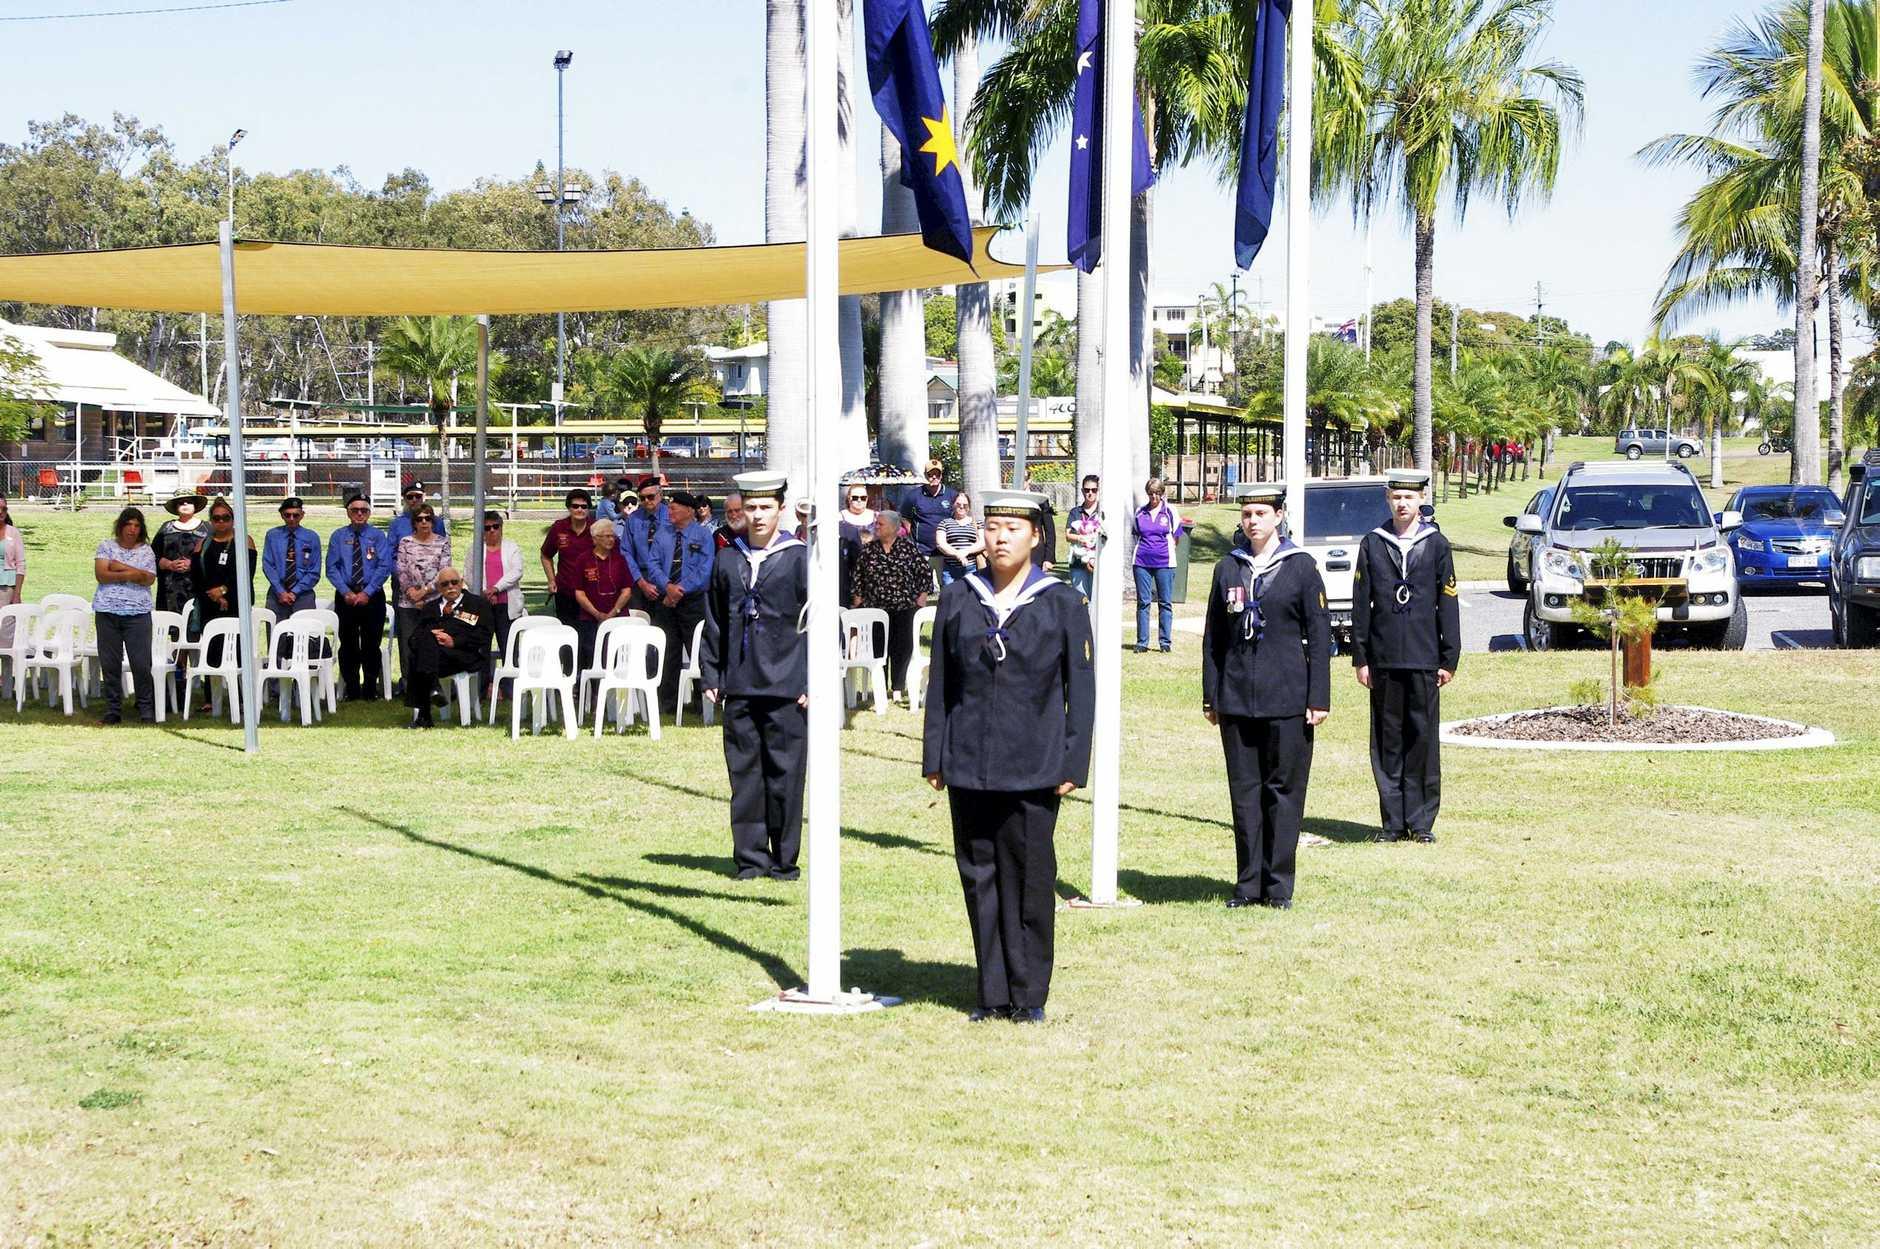 The Vietnam Veteran's Day service held in Gladstone last year.